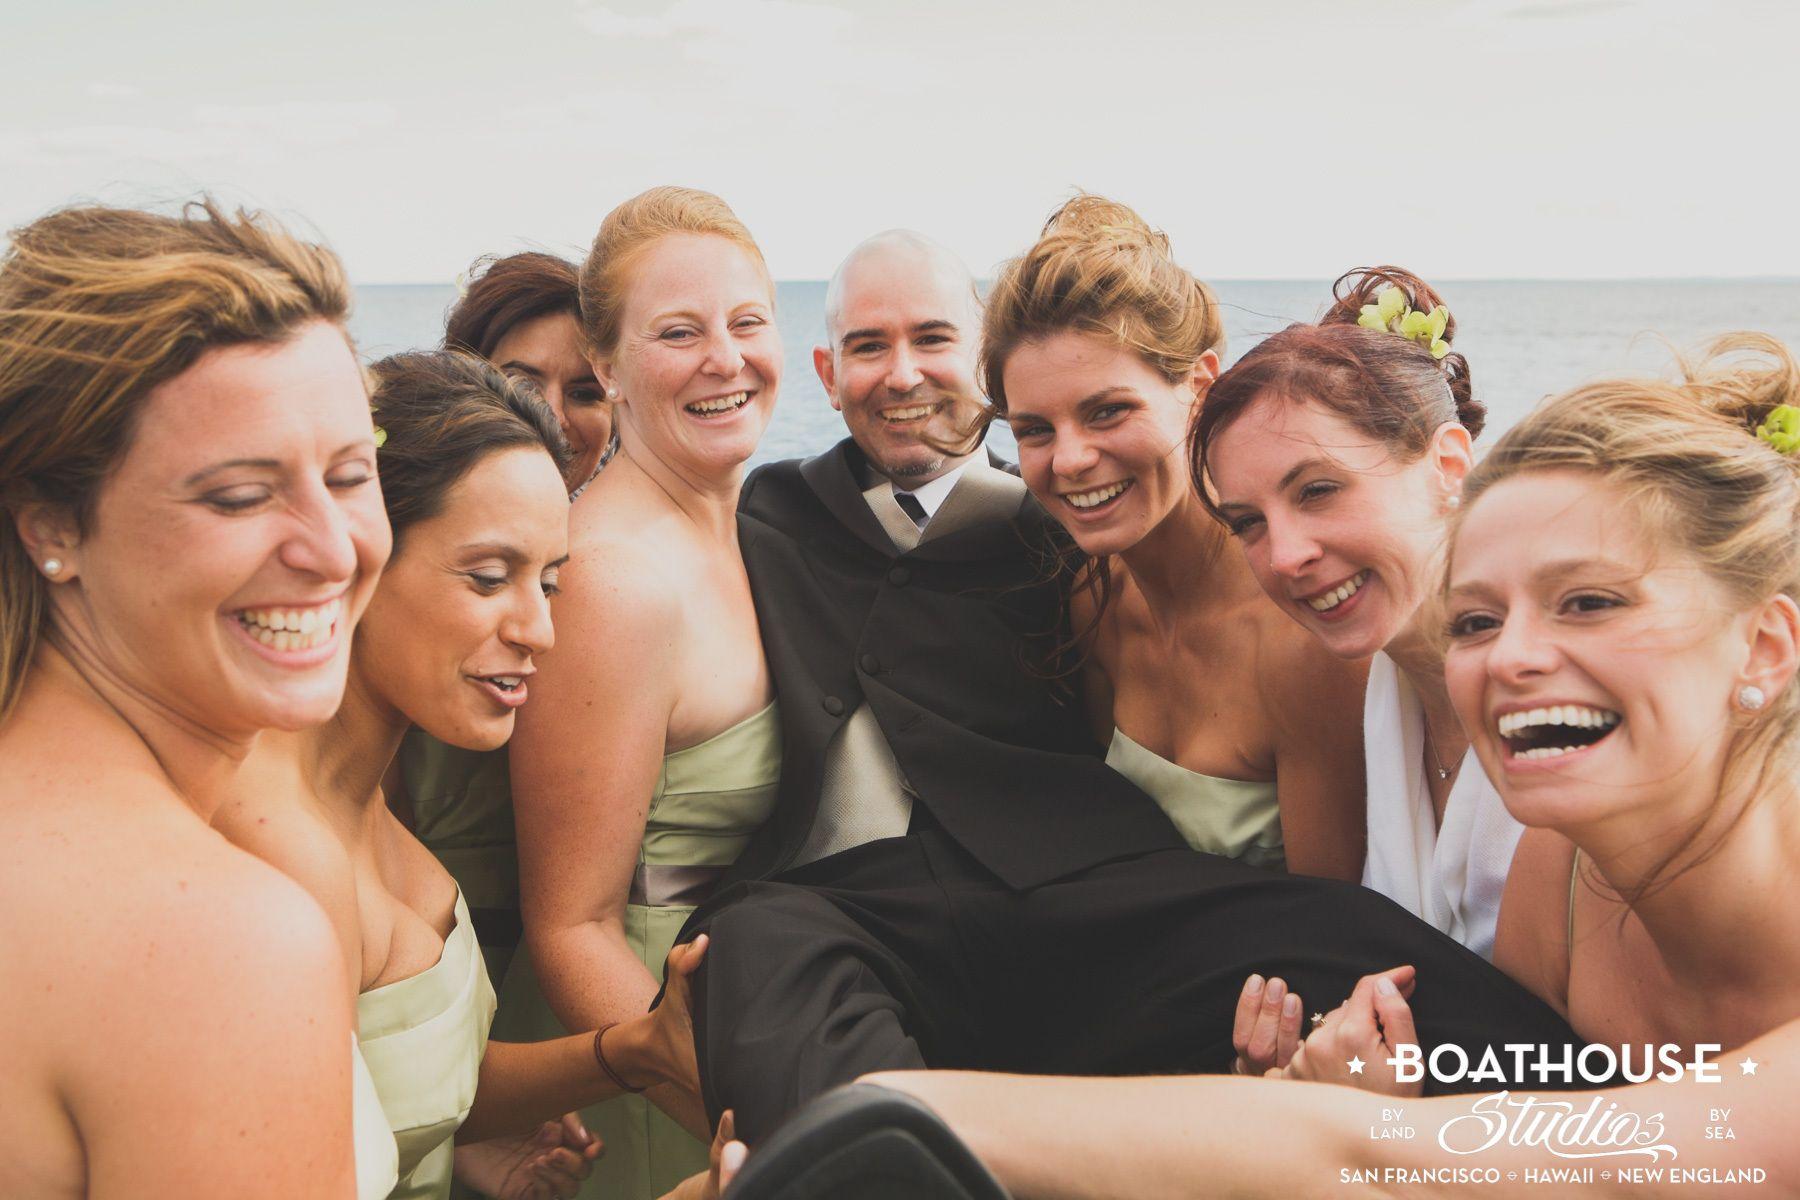 Seaside Kennebunkport, Maine Wedding at St. Ann's Church and The Nonantum Resort.